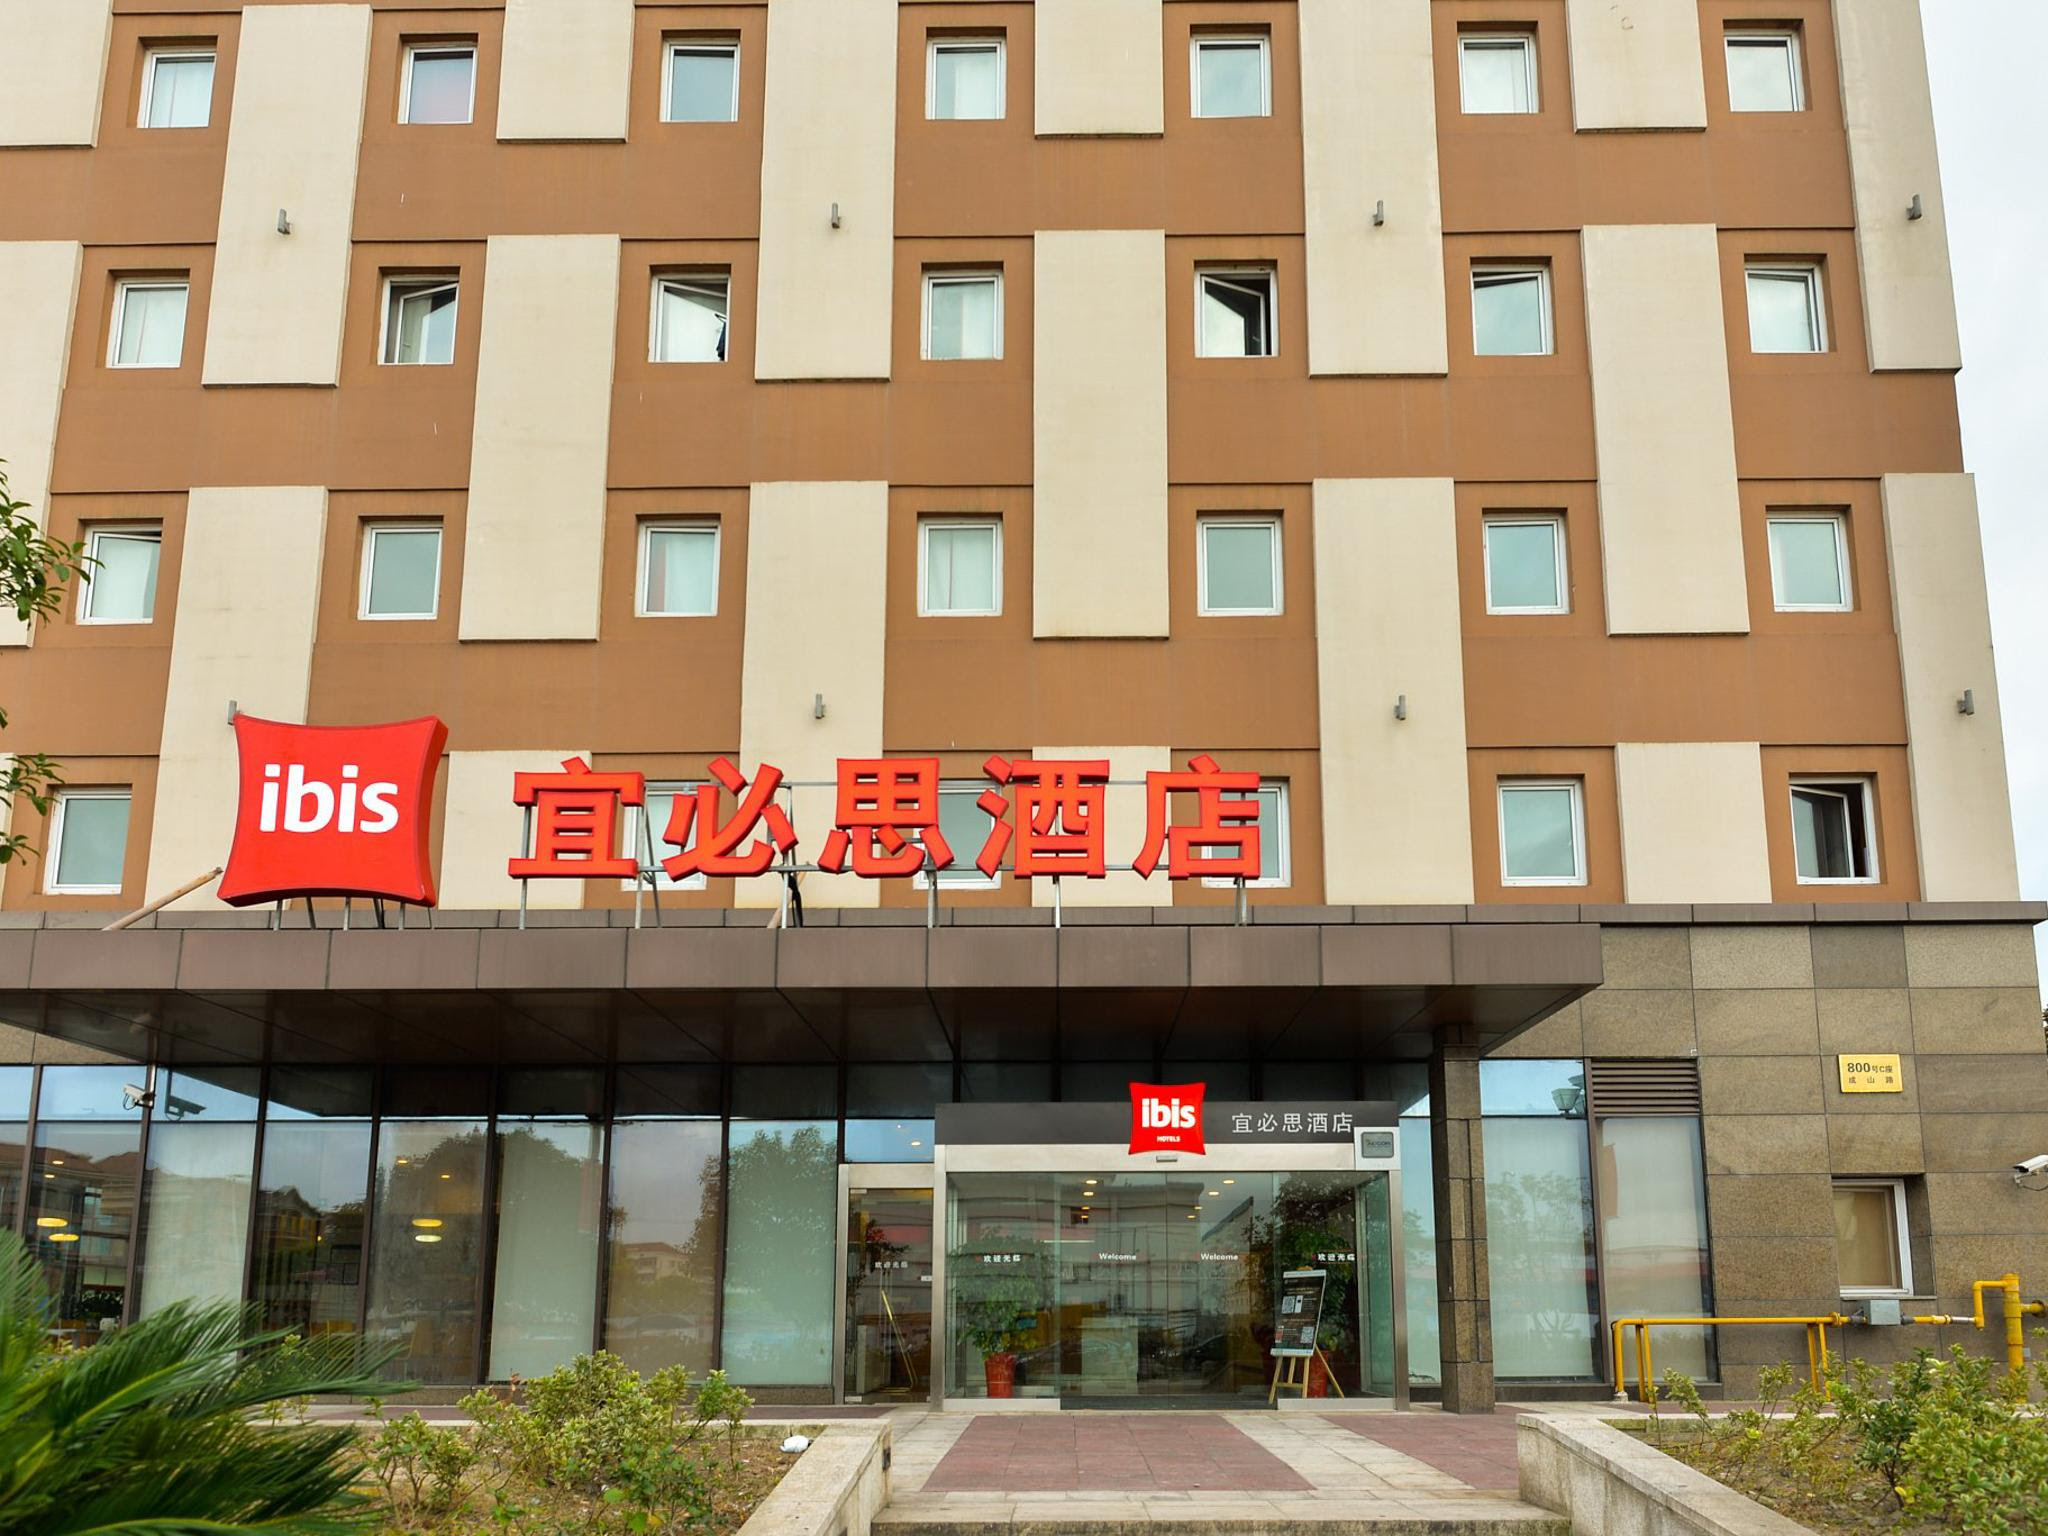 Ibis Shanghai Expo Hotel Reviews